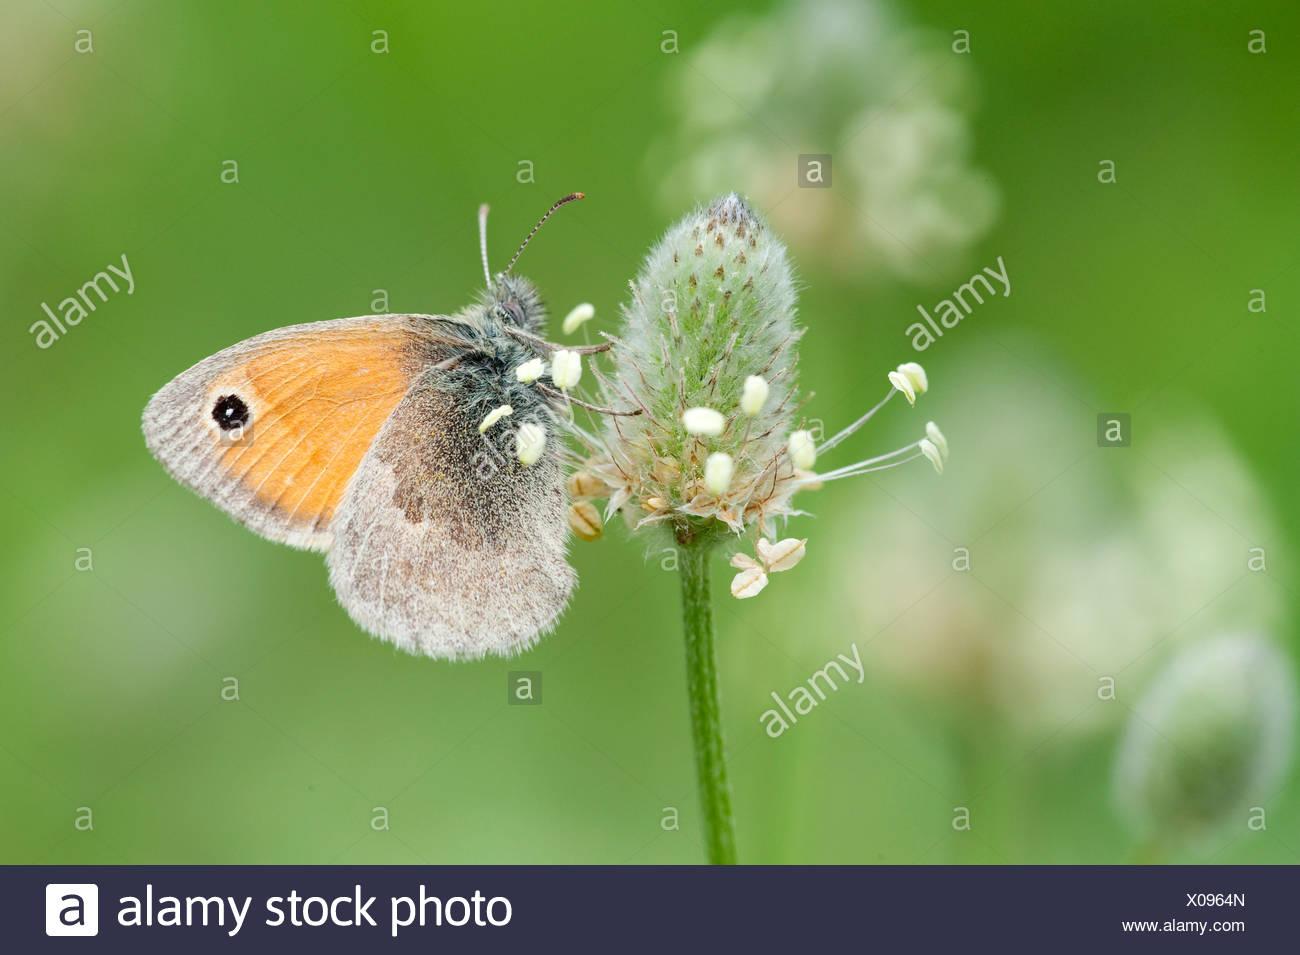 Small heath butterfly Coenoympha pamphilus Greece - Stock Image